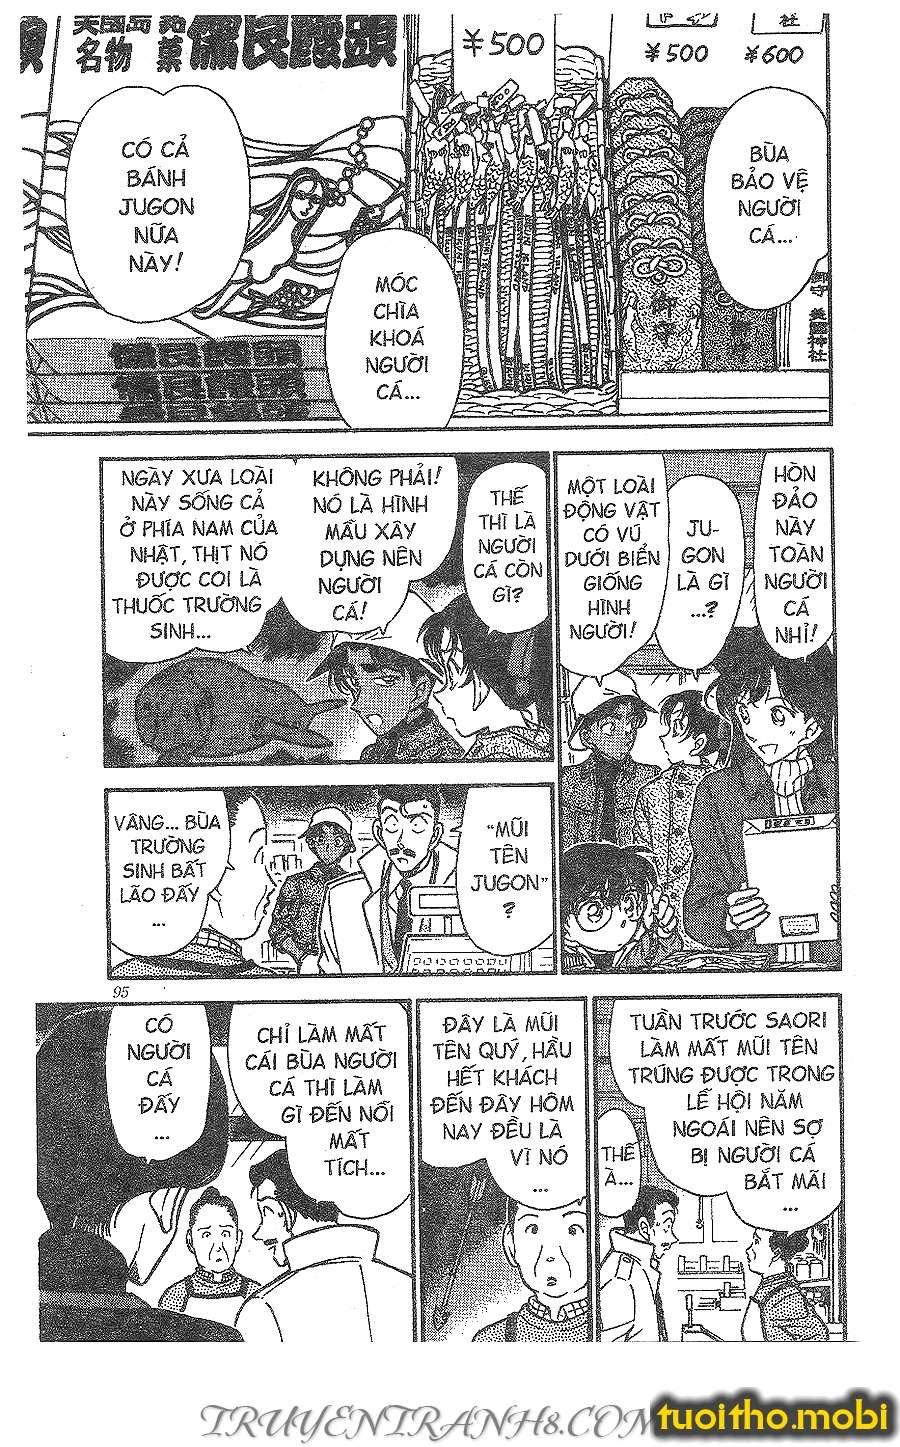 conan chương 279 trang 6